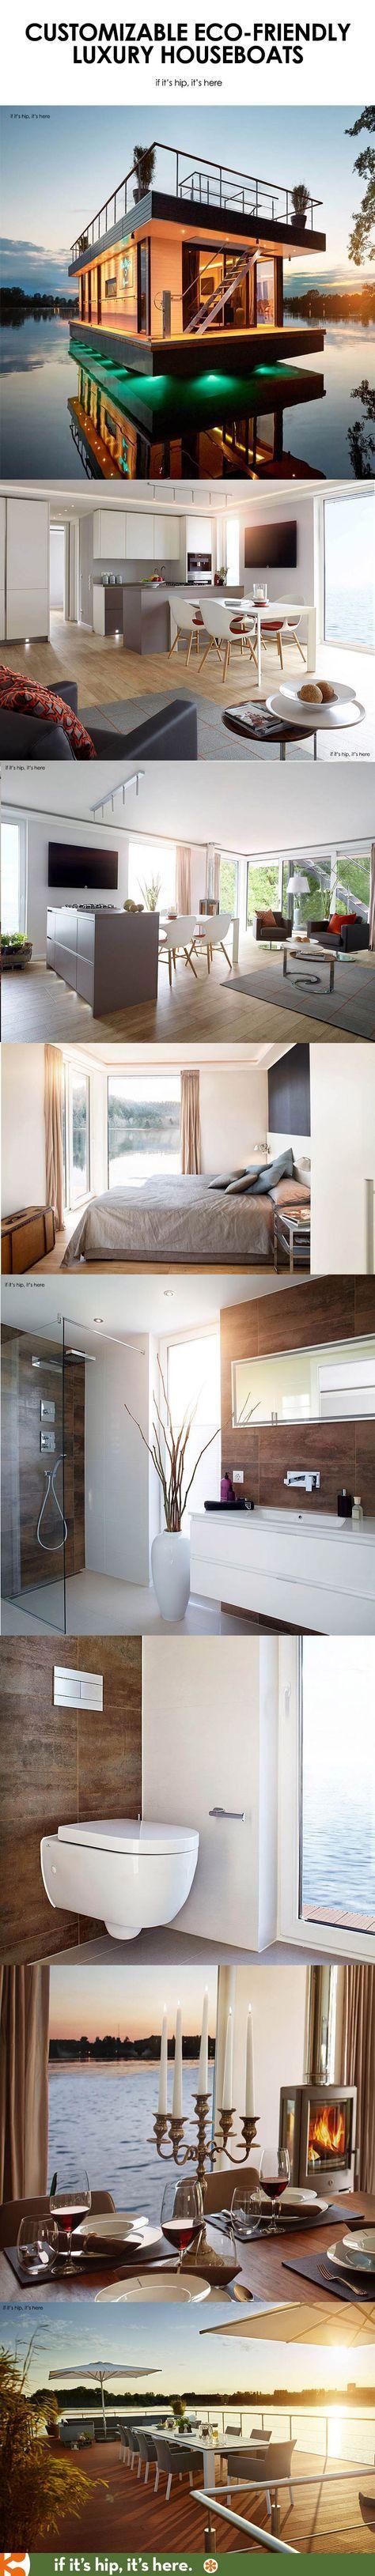 Luxus moderne esszimmer sets  best architecture images on pinterest